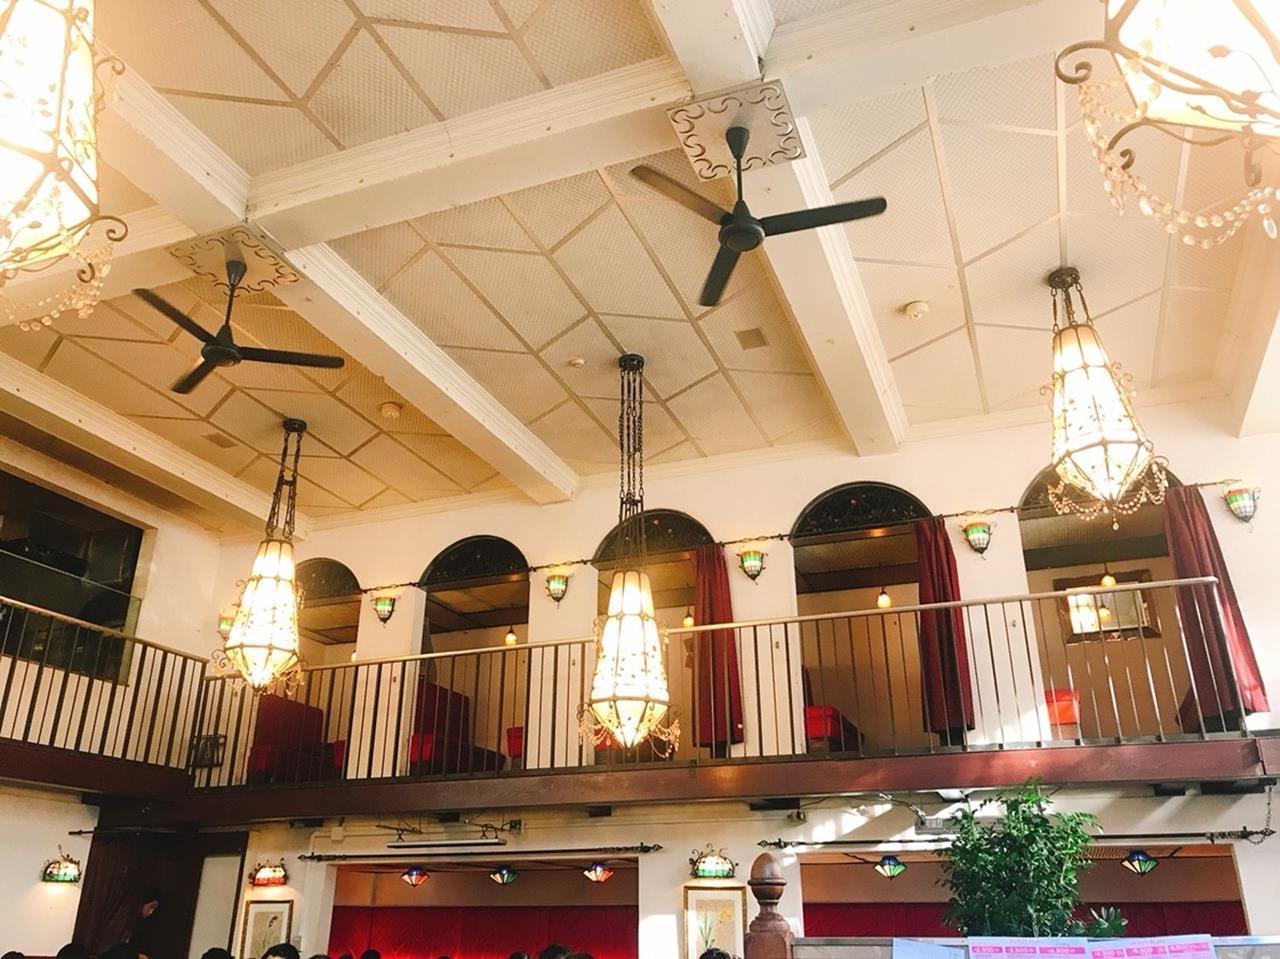 Café La Boheme 挑高、寬闊的開放式空間讓整間店更加有氛圍